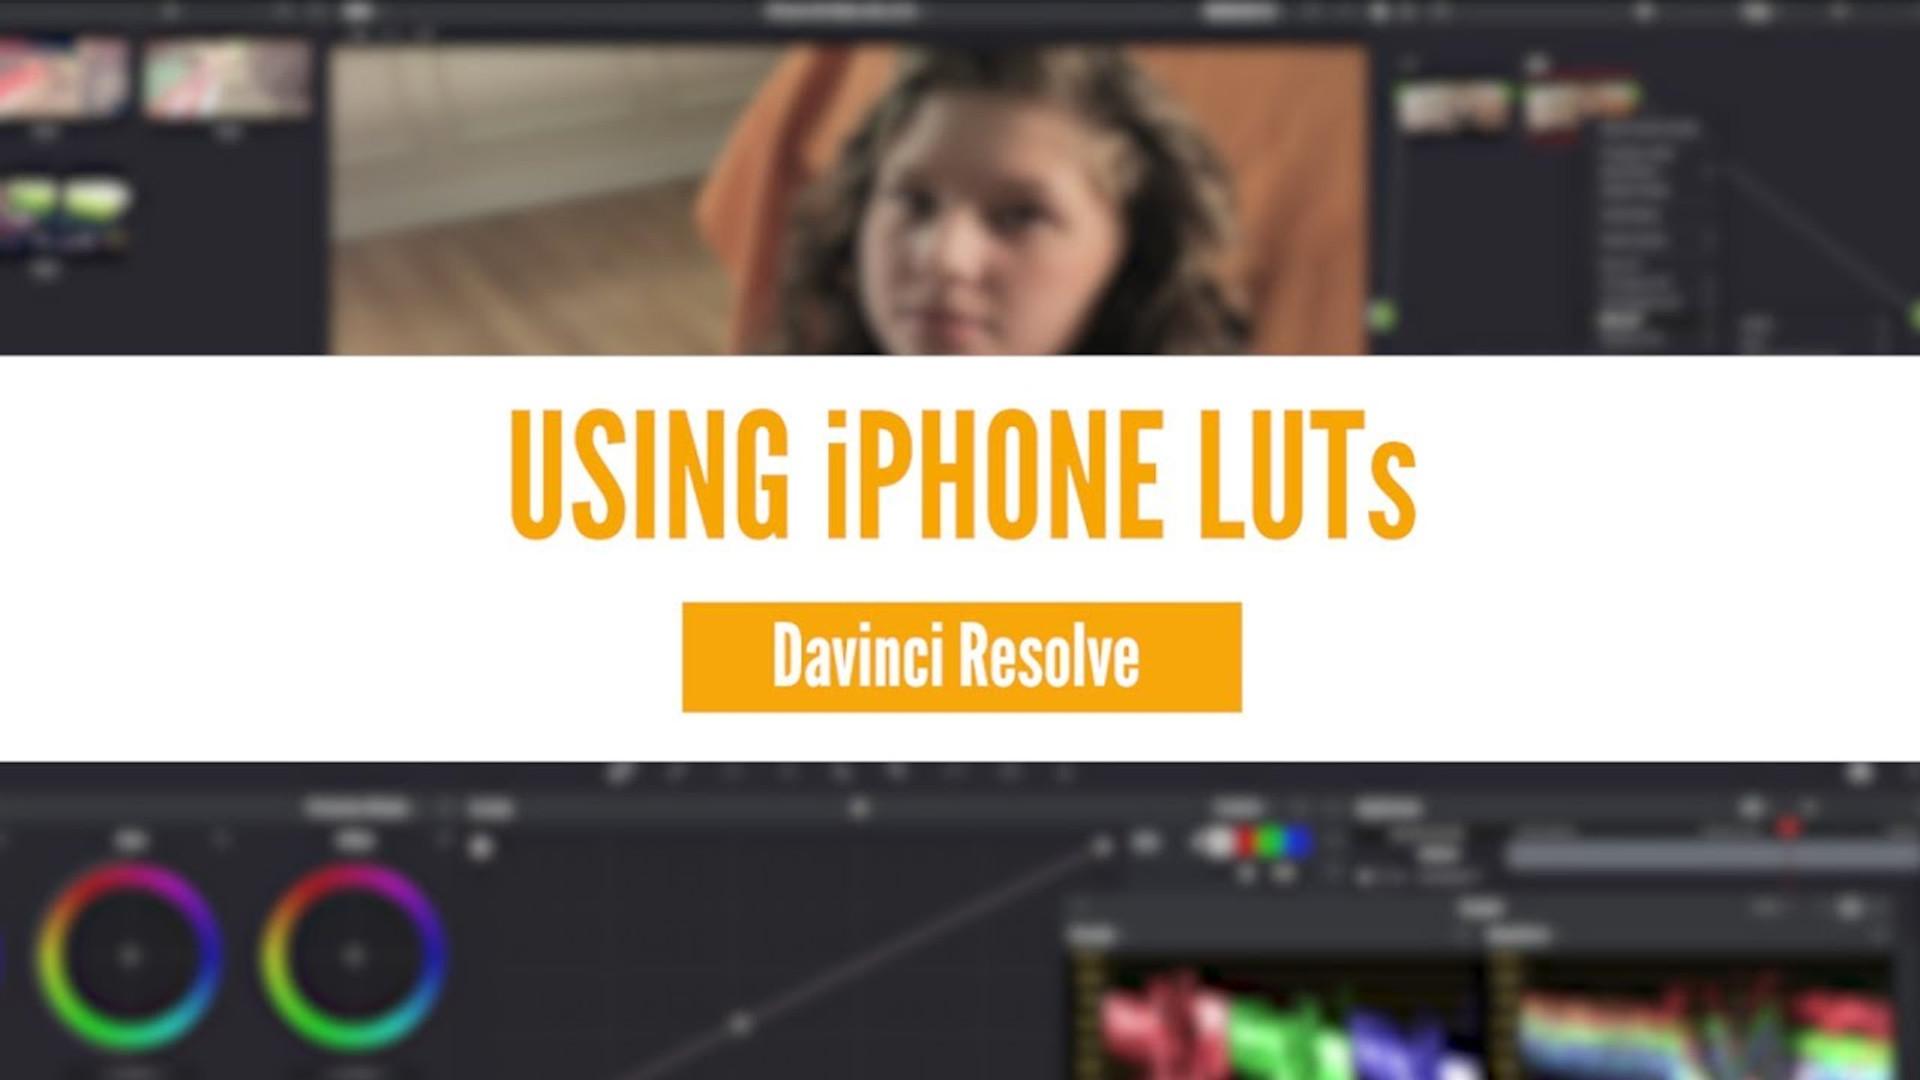 Using LUTs in Davinci Resolve